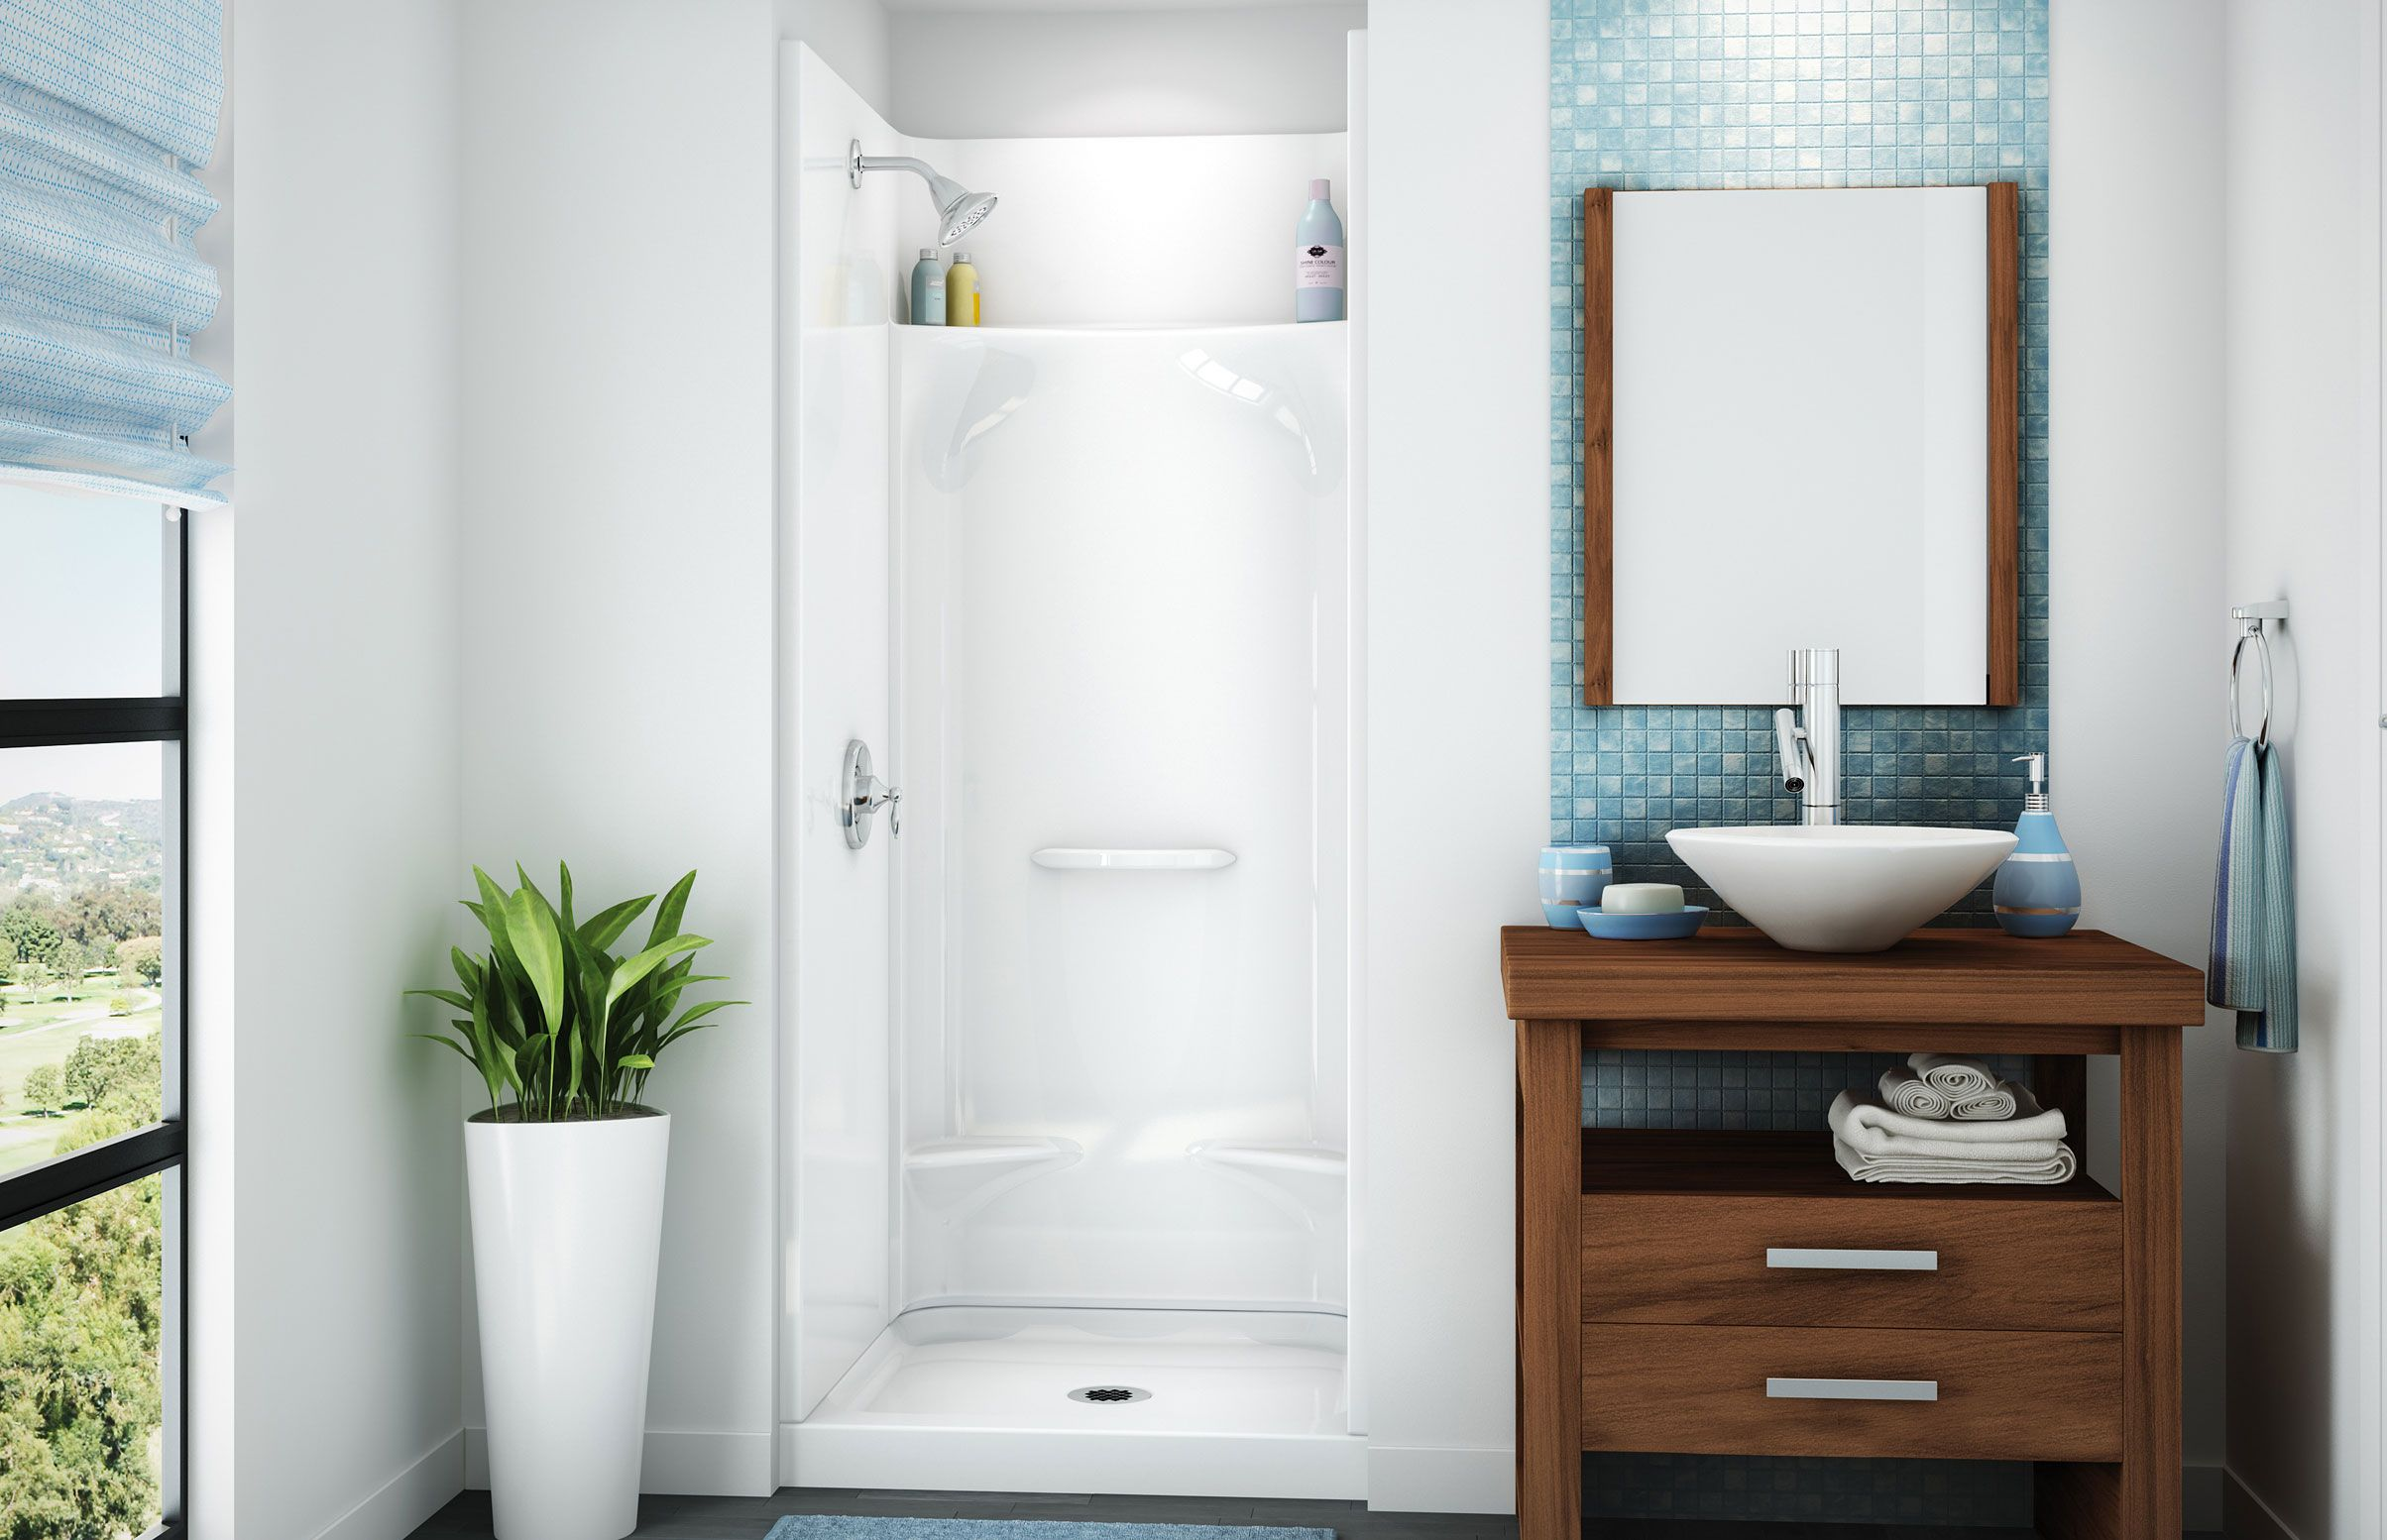 MAAX - KDS 3232 Alcove Shower www.maax.com | bathroom | Pinterest ...